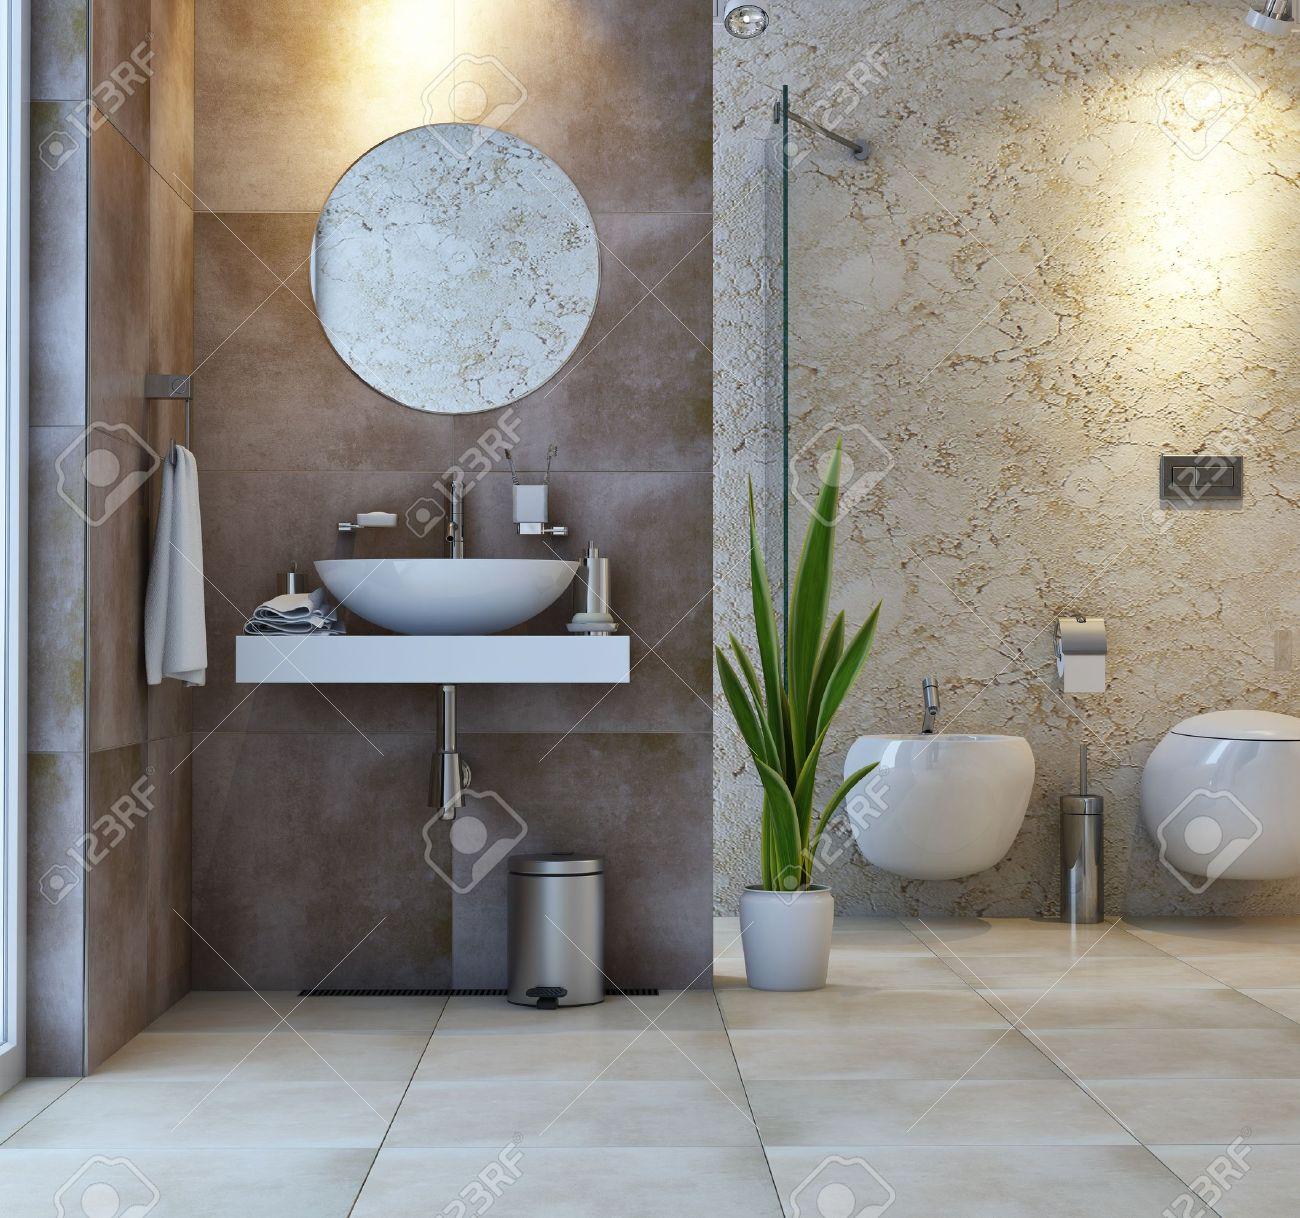 Toilet Interior Design interior bathroom scene stock photo, picture and royalty free